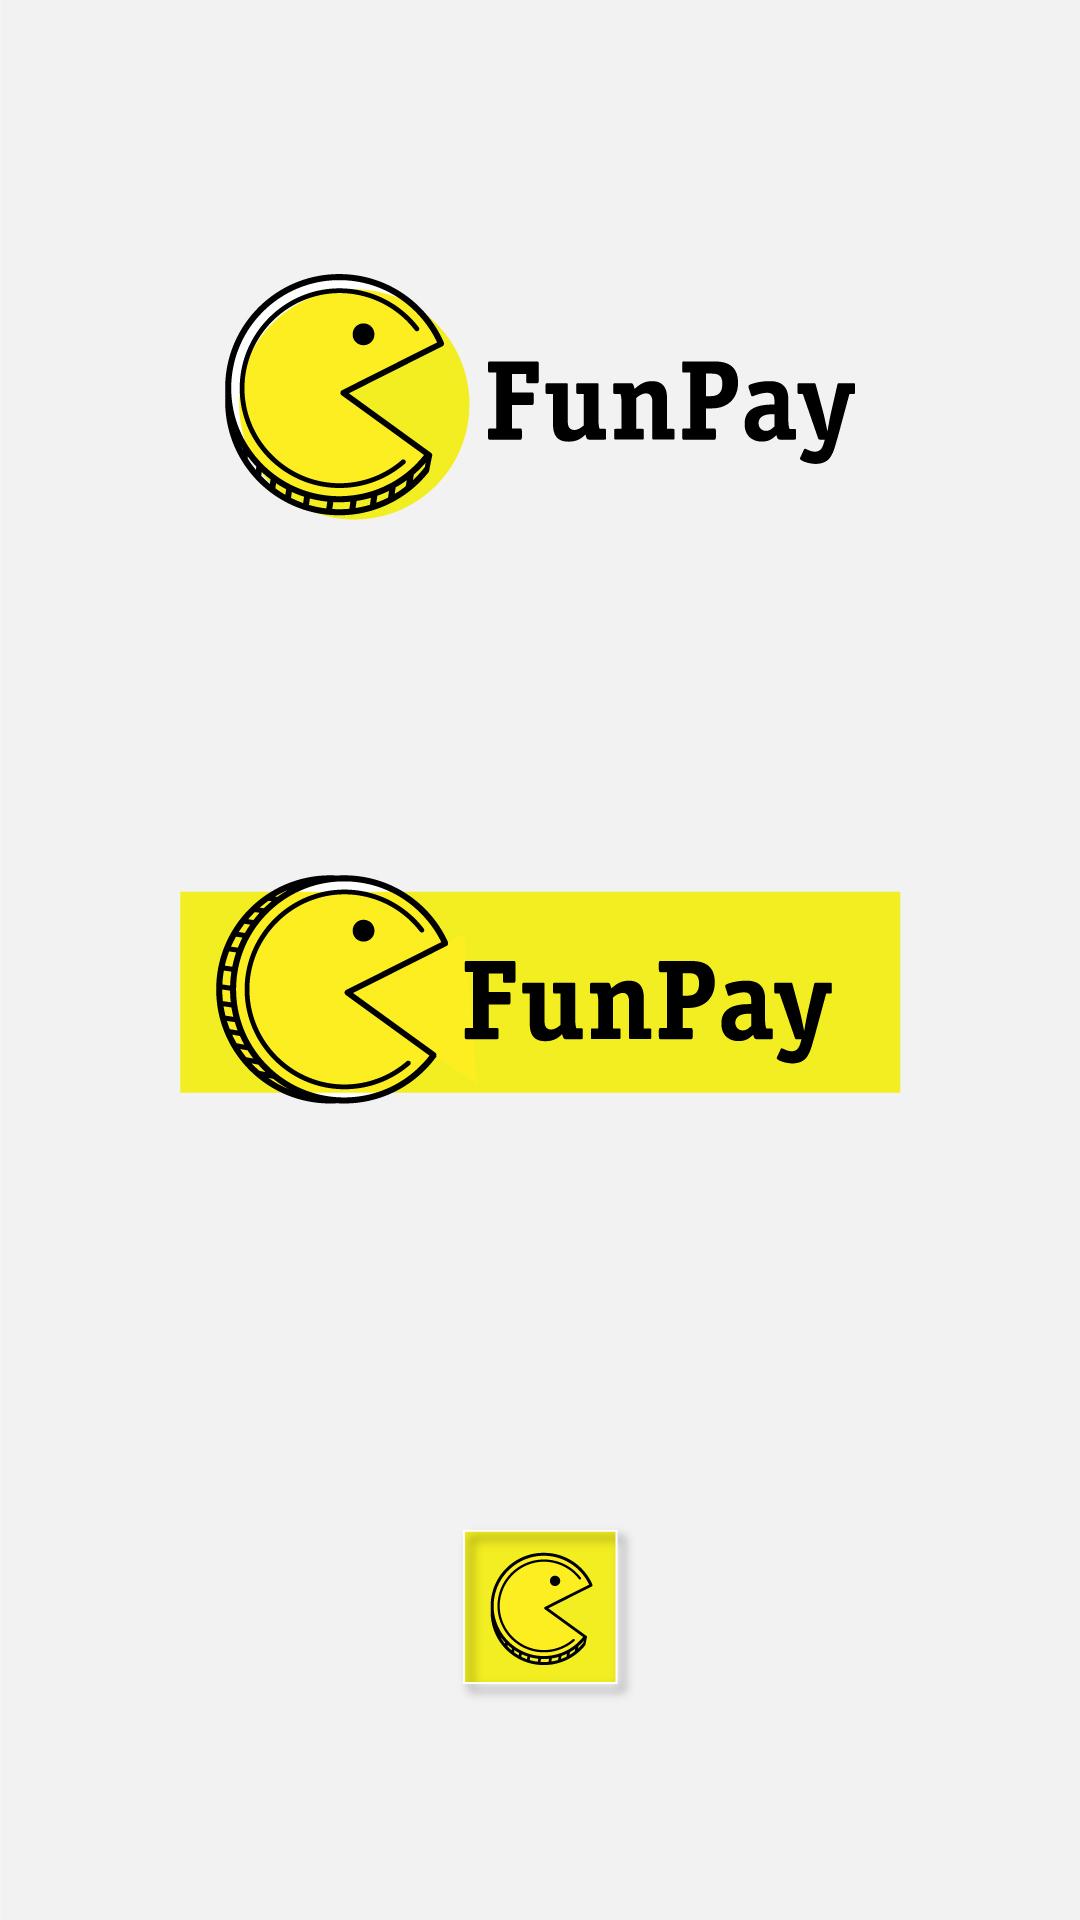 Логотип для FunPay.ru фото f_34959a06882d1876.jpg